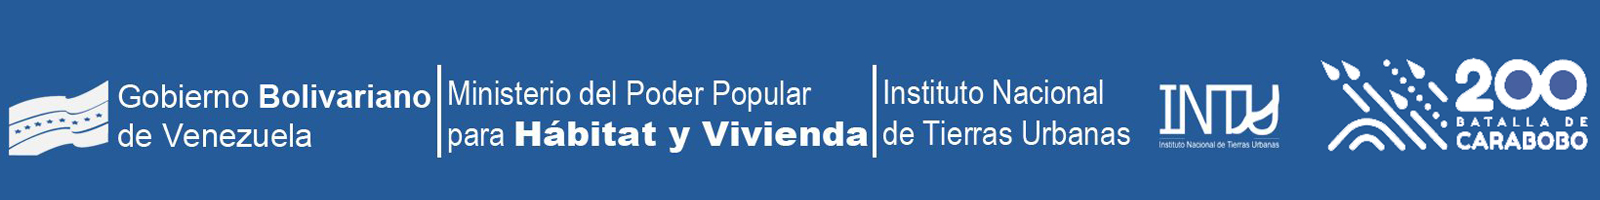 INSTITUTO NACIONAL DE TIERRAS URBANAS